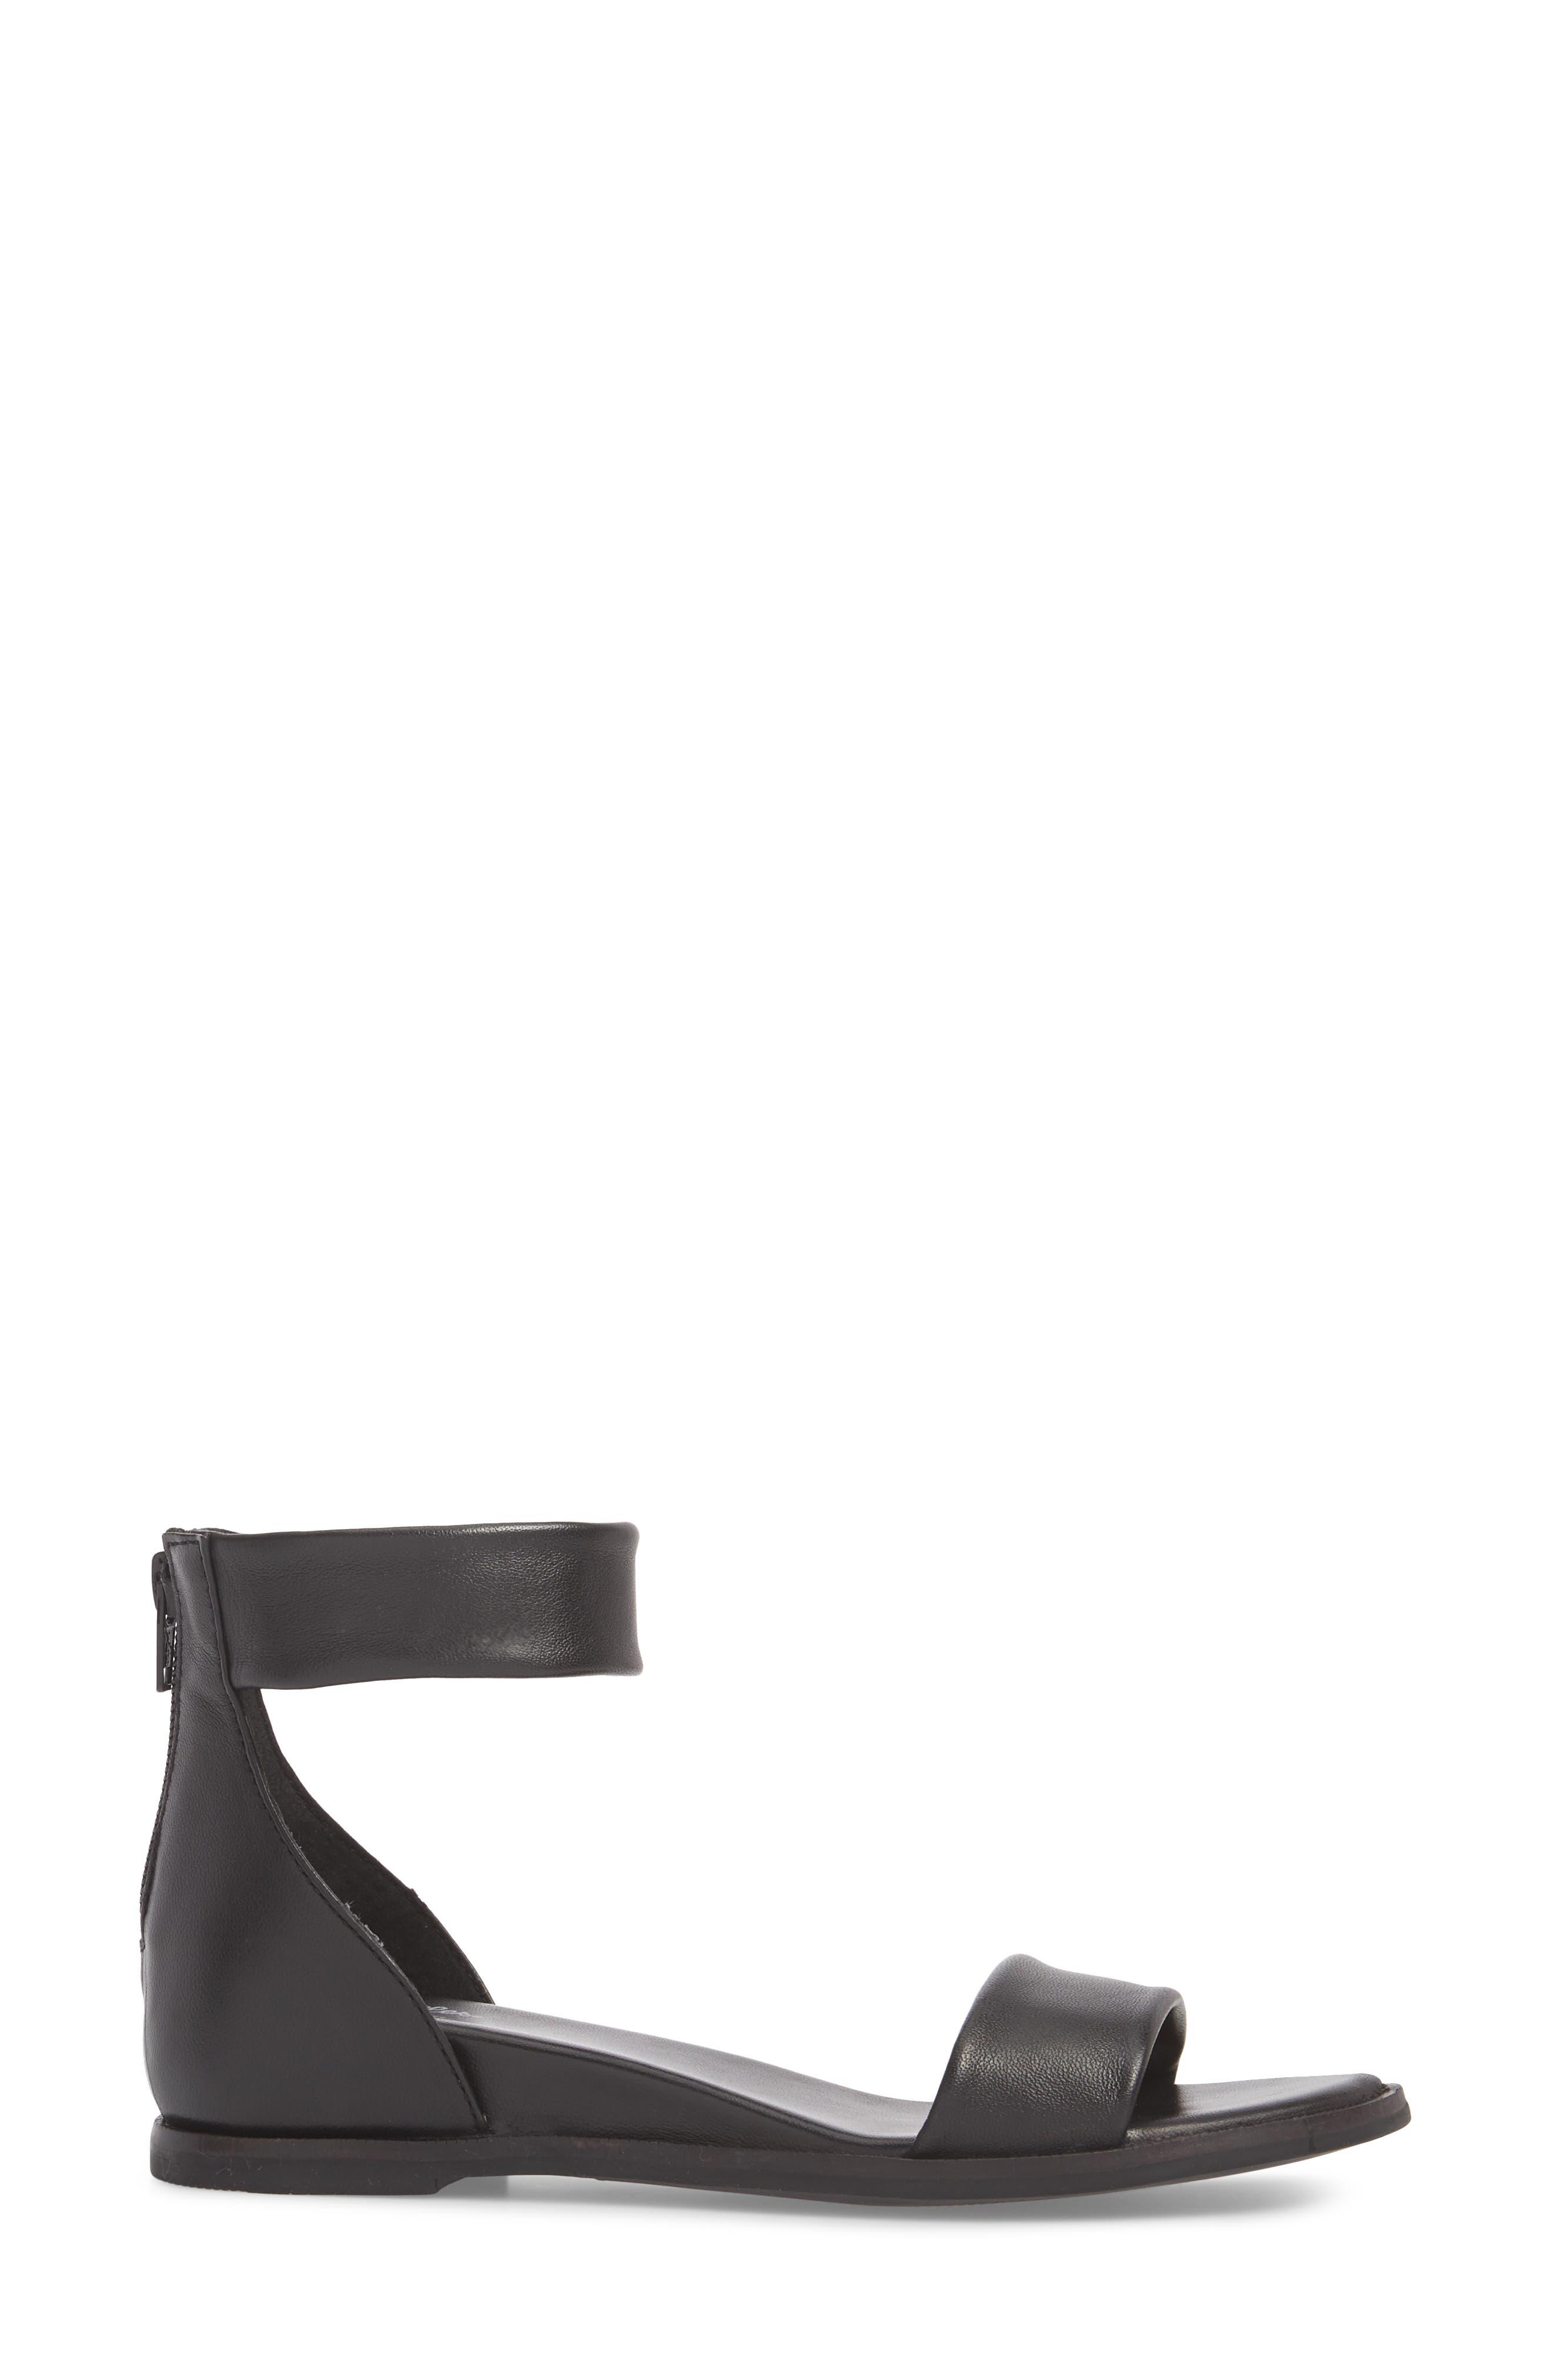 Ankle Strap Sandal,                             Alternate thumbnail 3, color,                             BLACK LEATHER